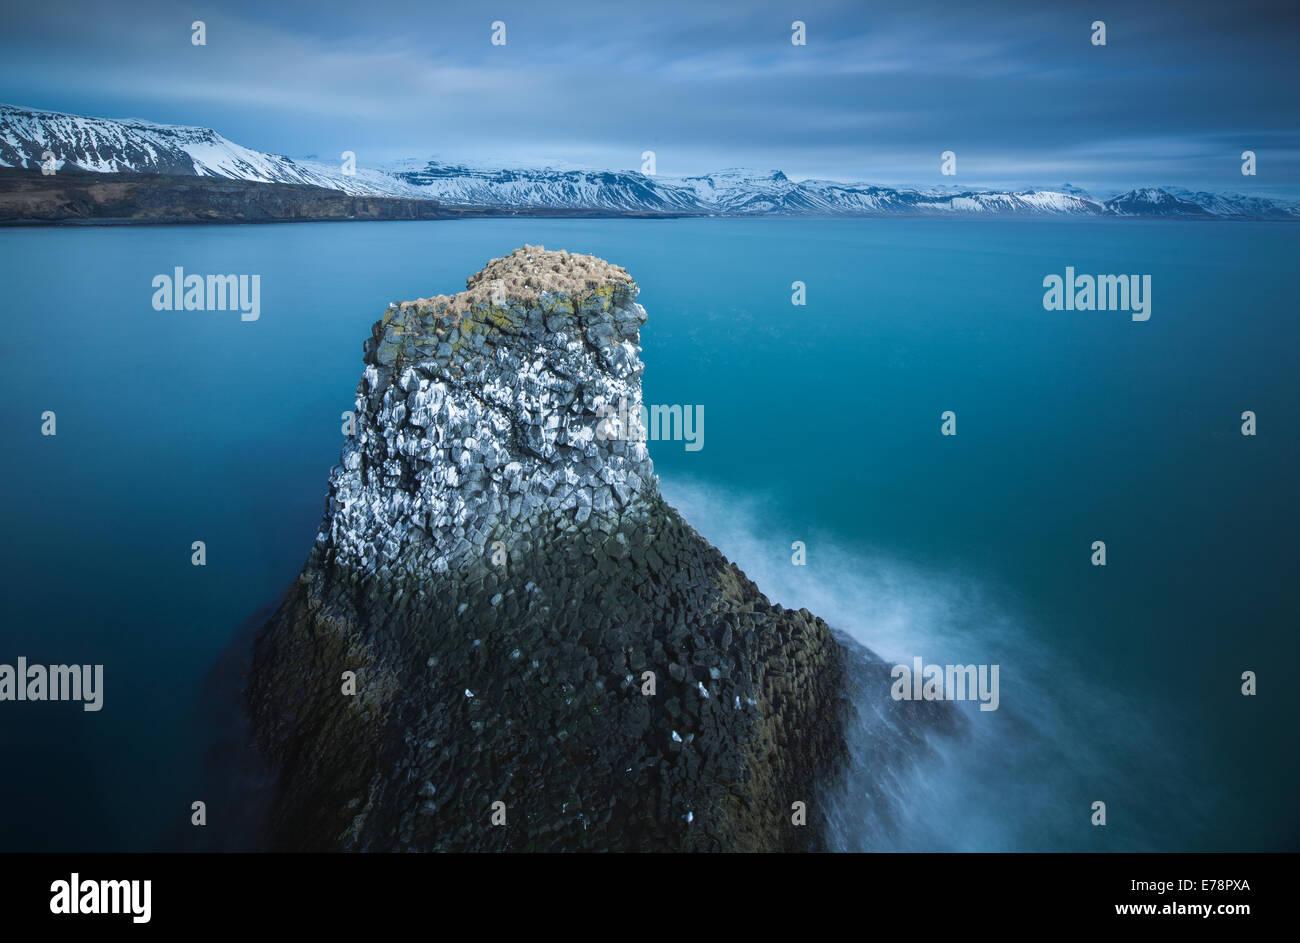 a sea stack streaked with the guano of fulmars and kittiwakes, nr Arnastapi, Snaefellsnes Peninsula, western Iceland - Stock Image